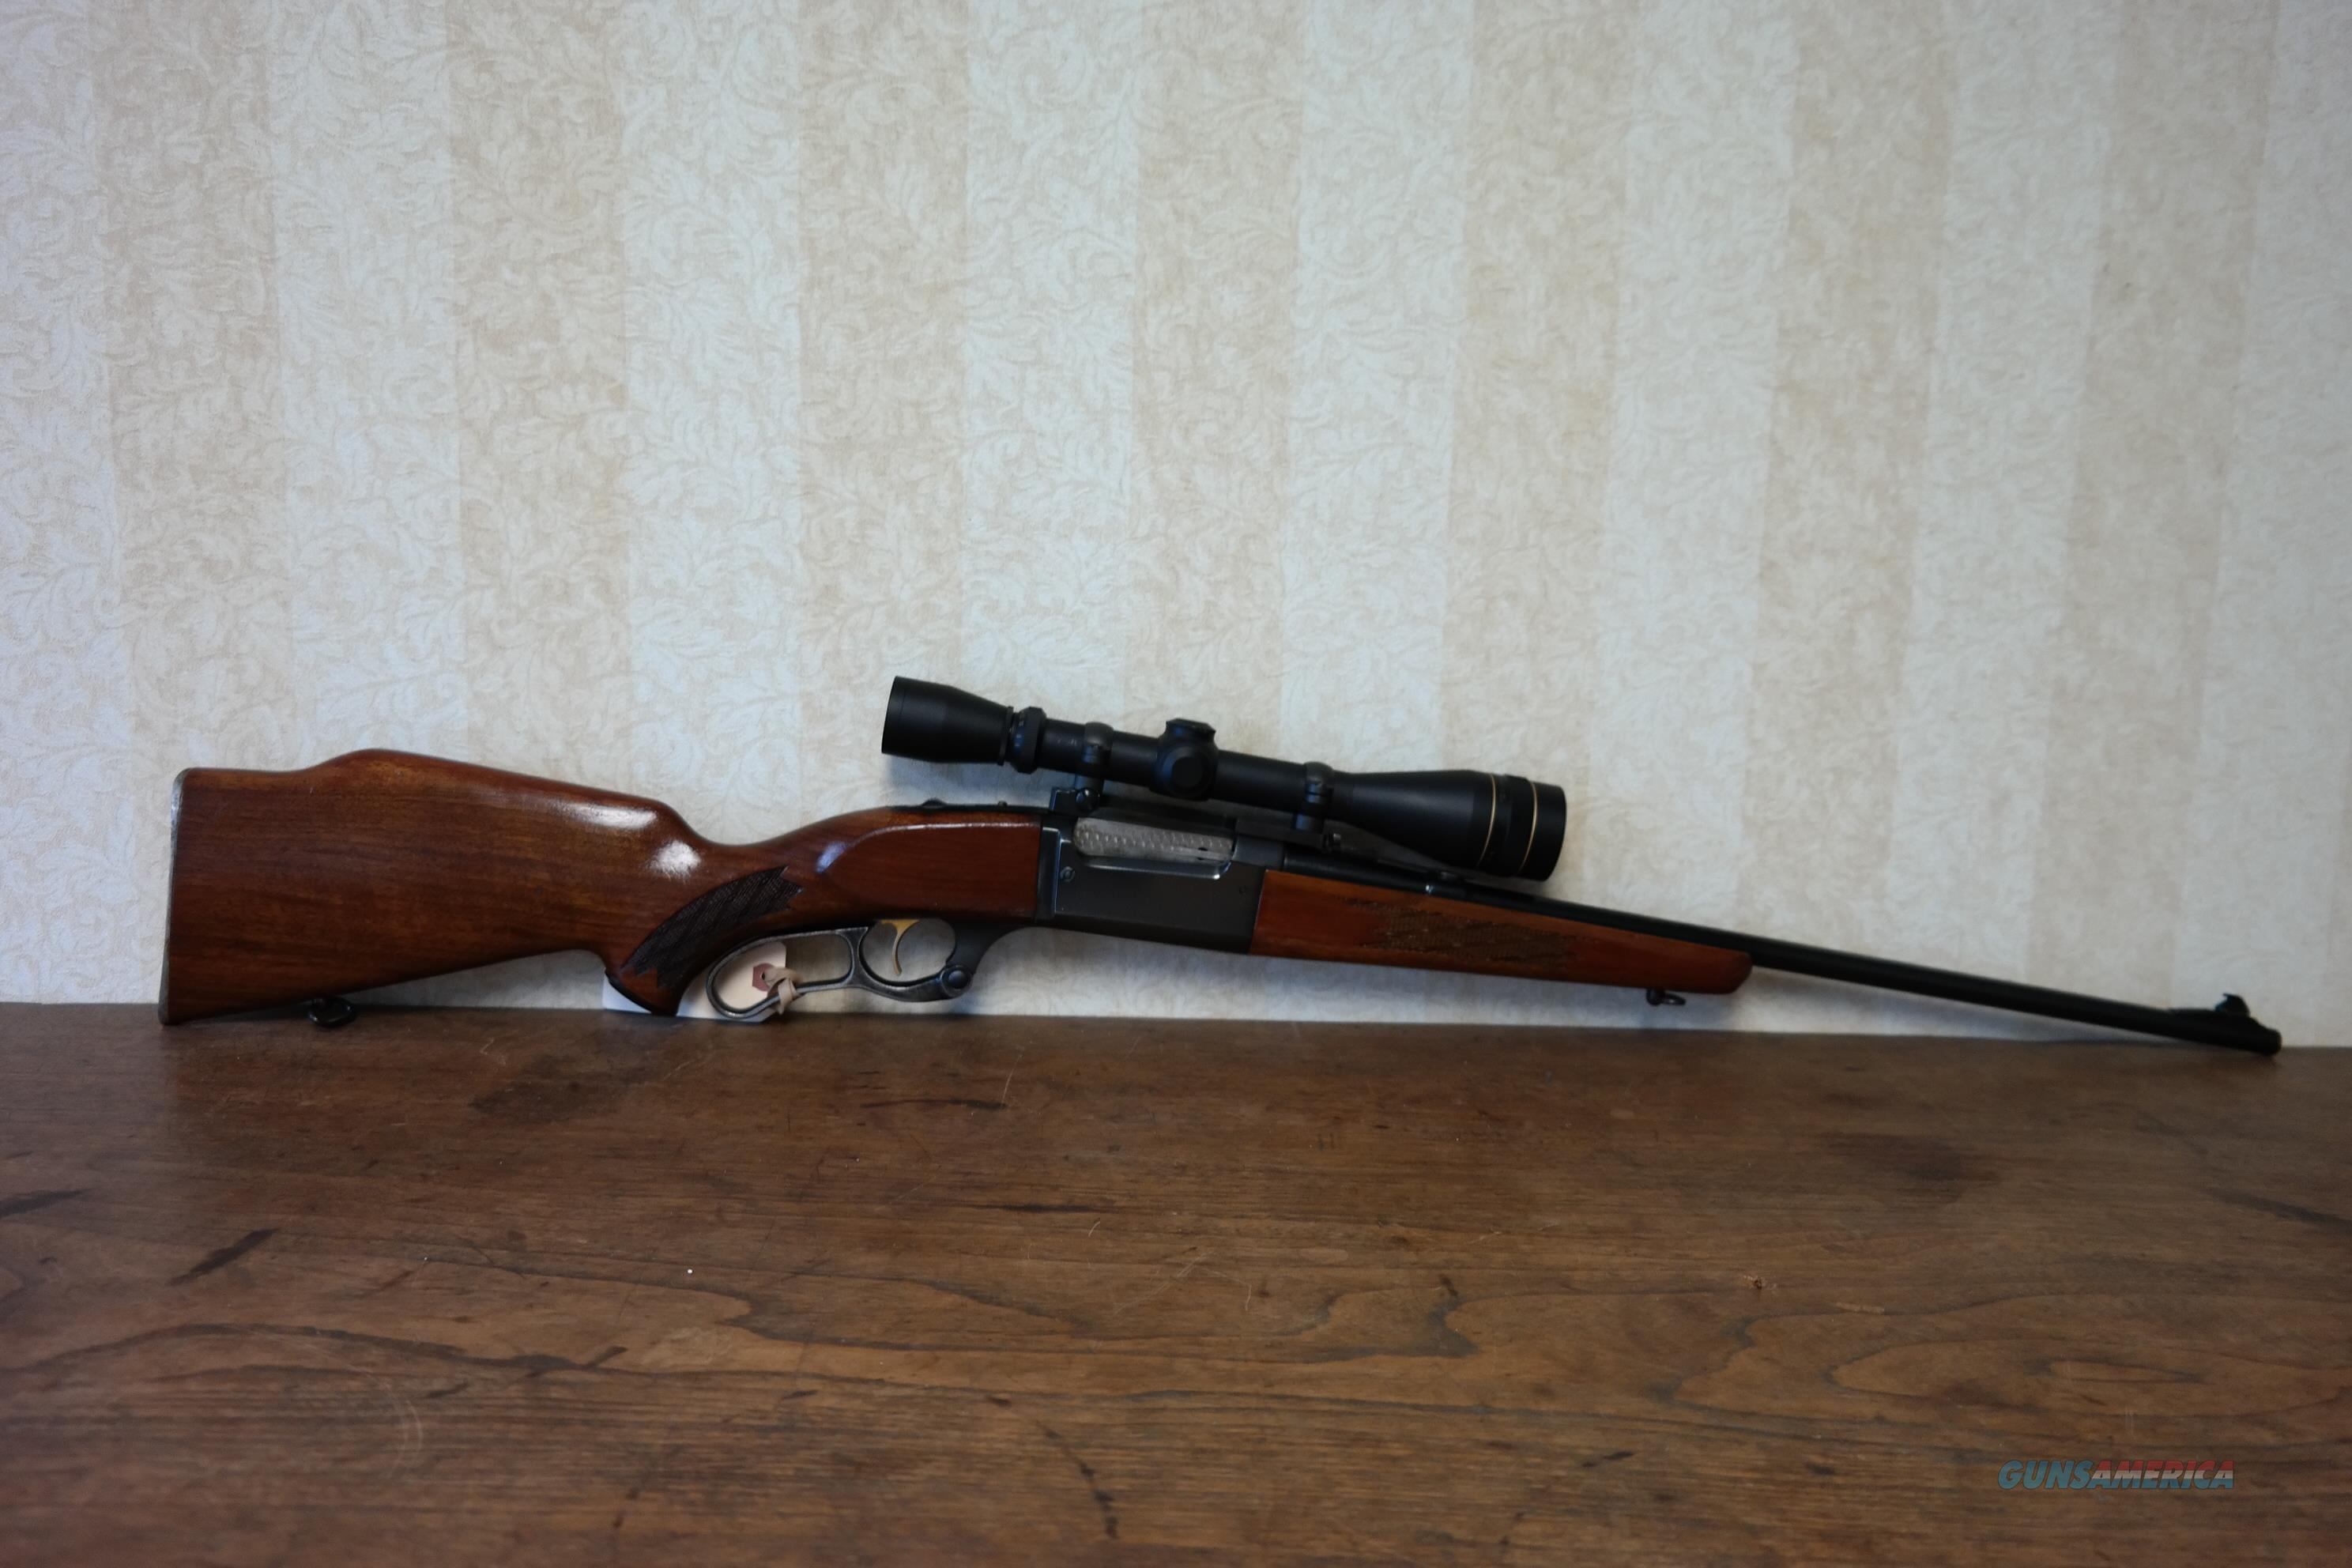 Savage 99m .308 Win w/ Leupold Scope  Guns > Rifles > Savage Rifles > Model 95/99 Family